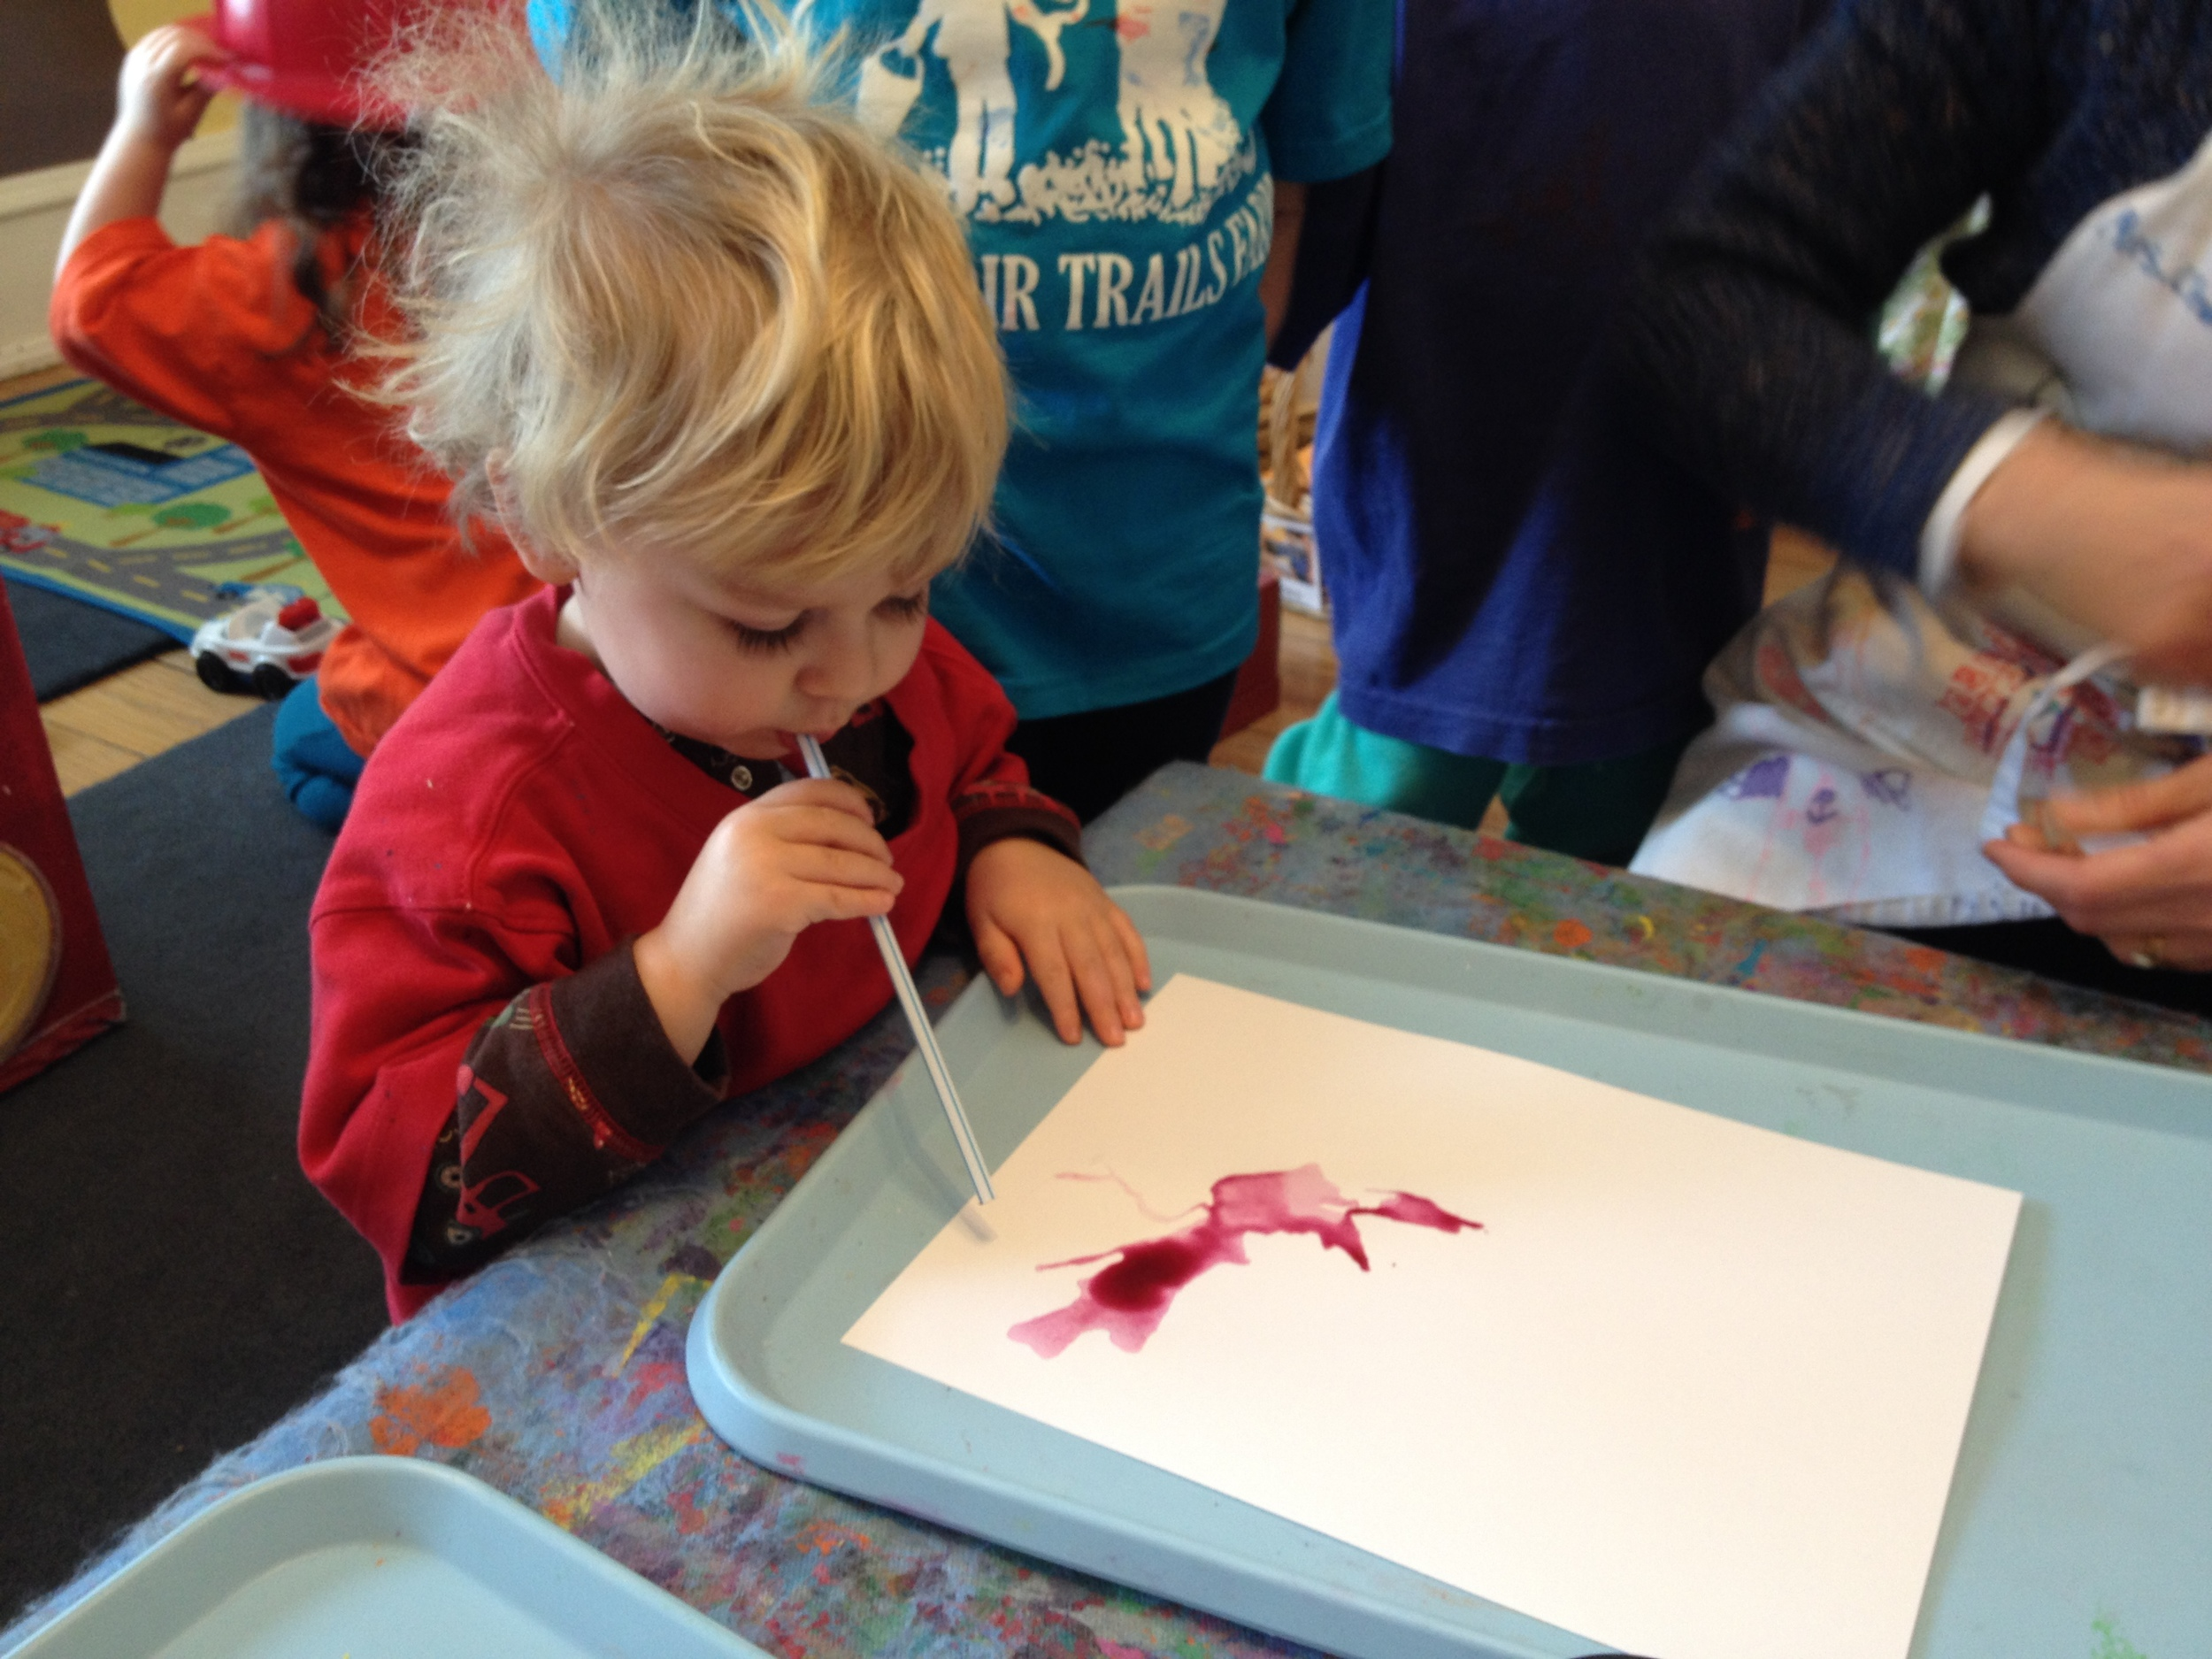 Straw painting